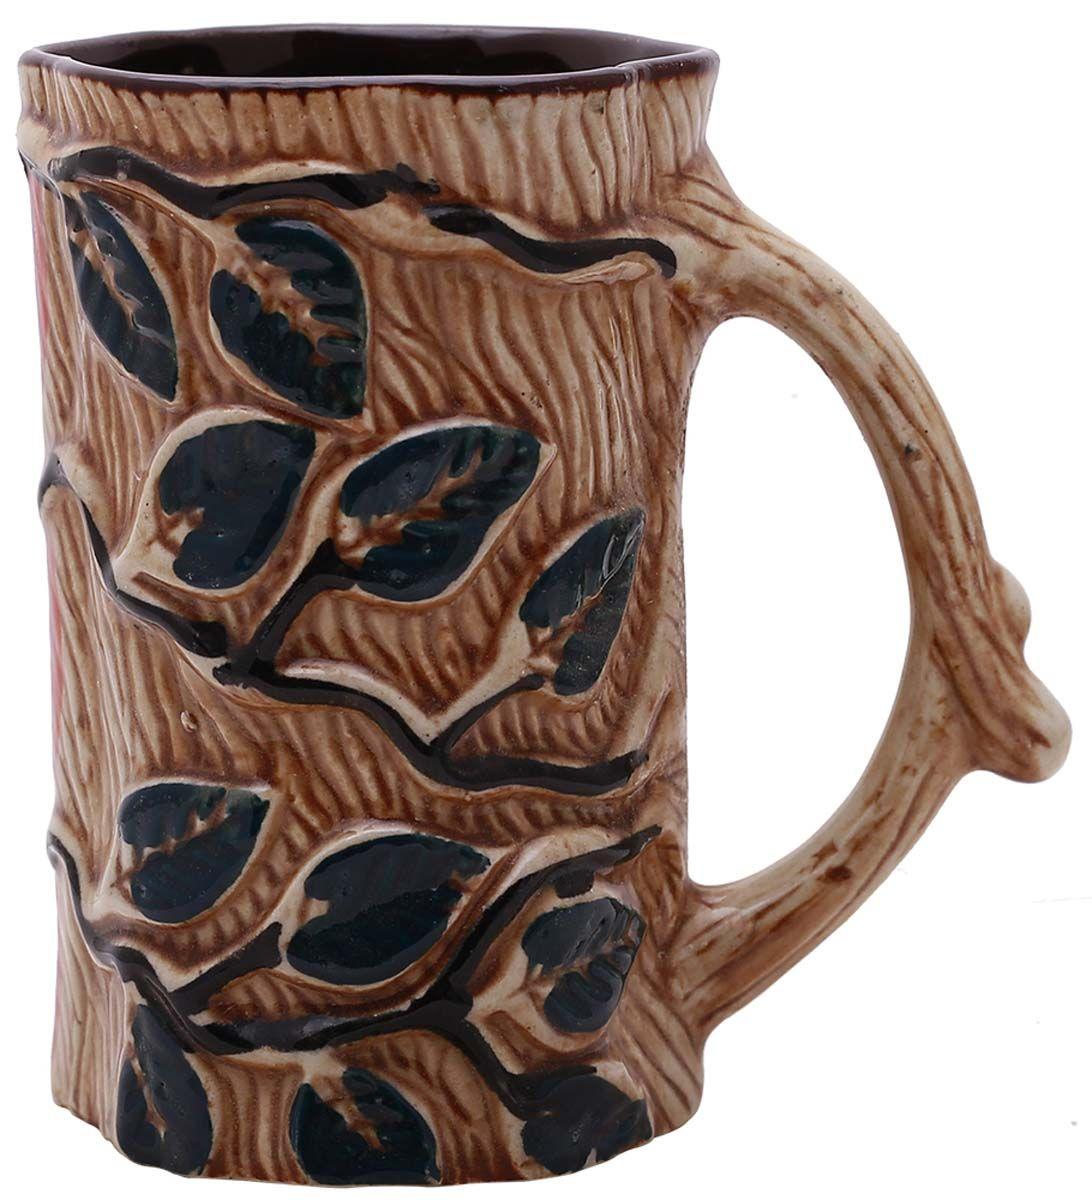 Bulk Wholesale Colorful Handmade Ceramic Beer / Iced Tea